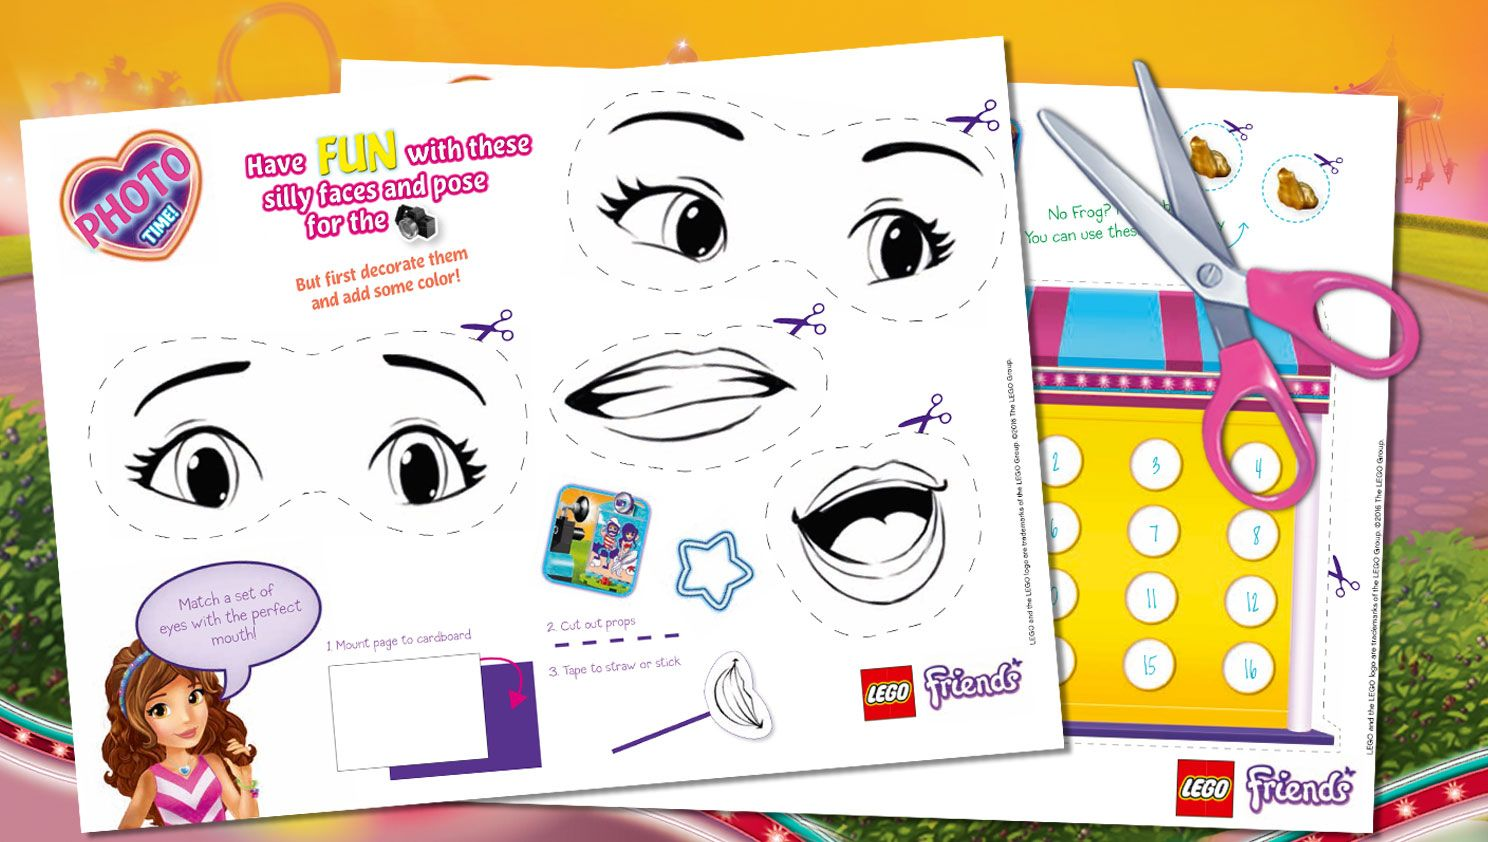 Pin by Kantuta Camus on lego   Pinterest   Party kit, Lego and Lego ...